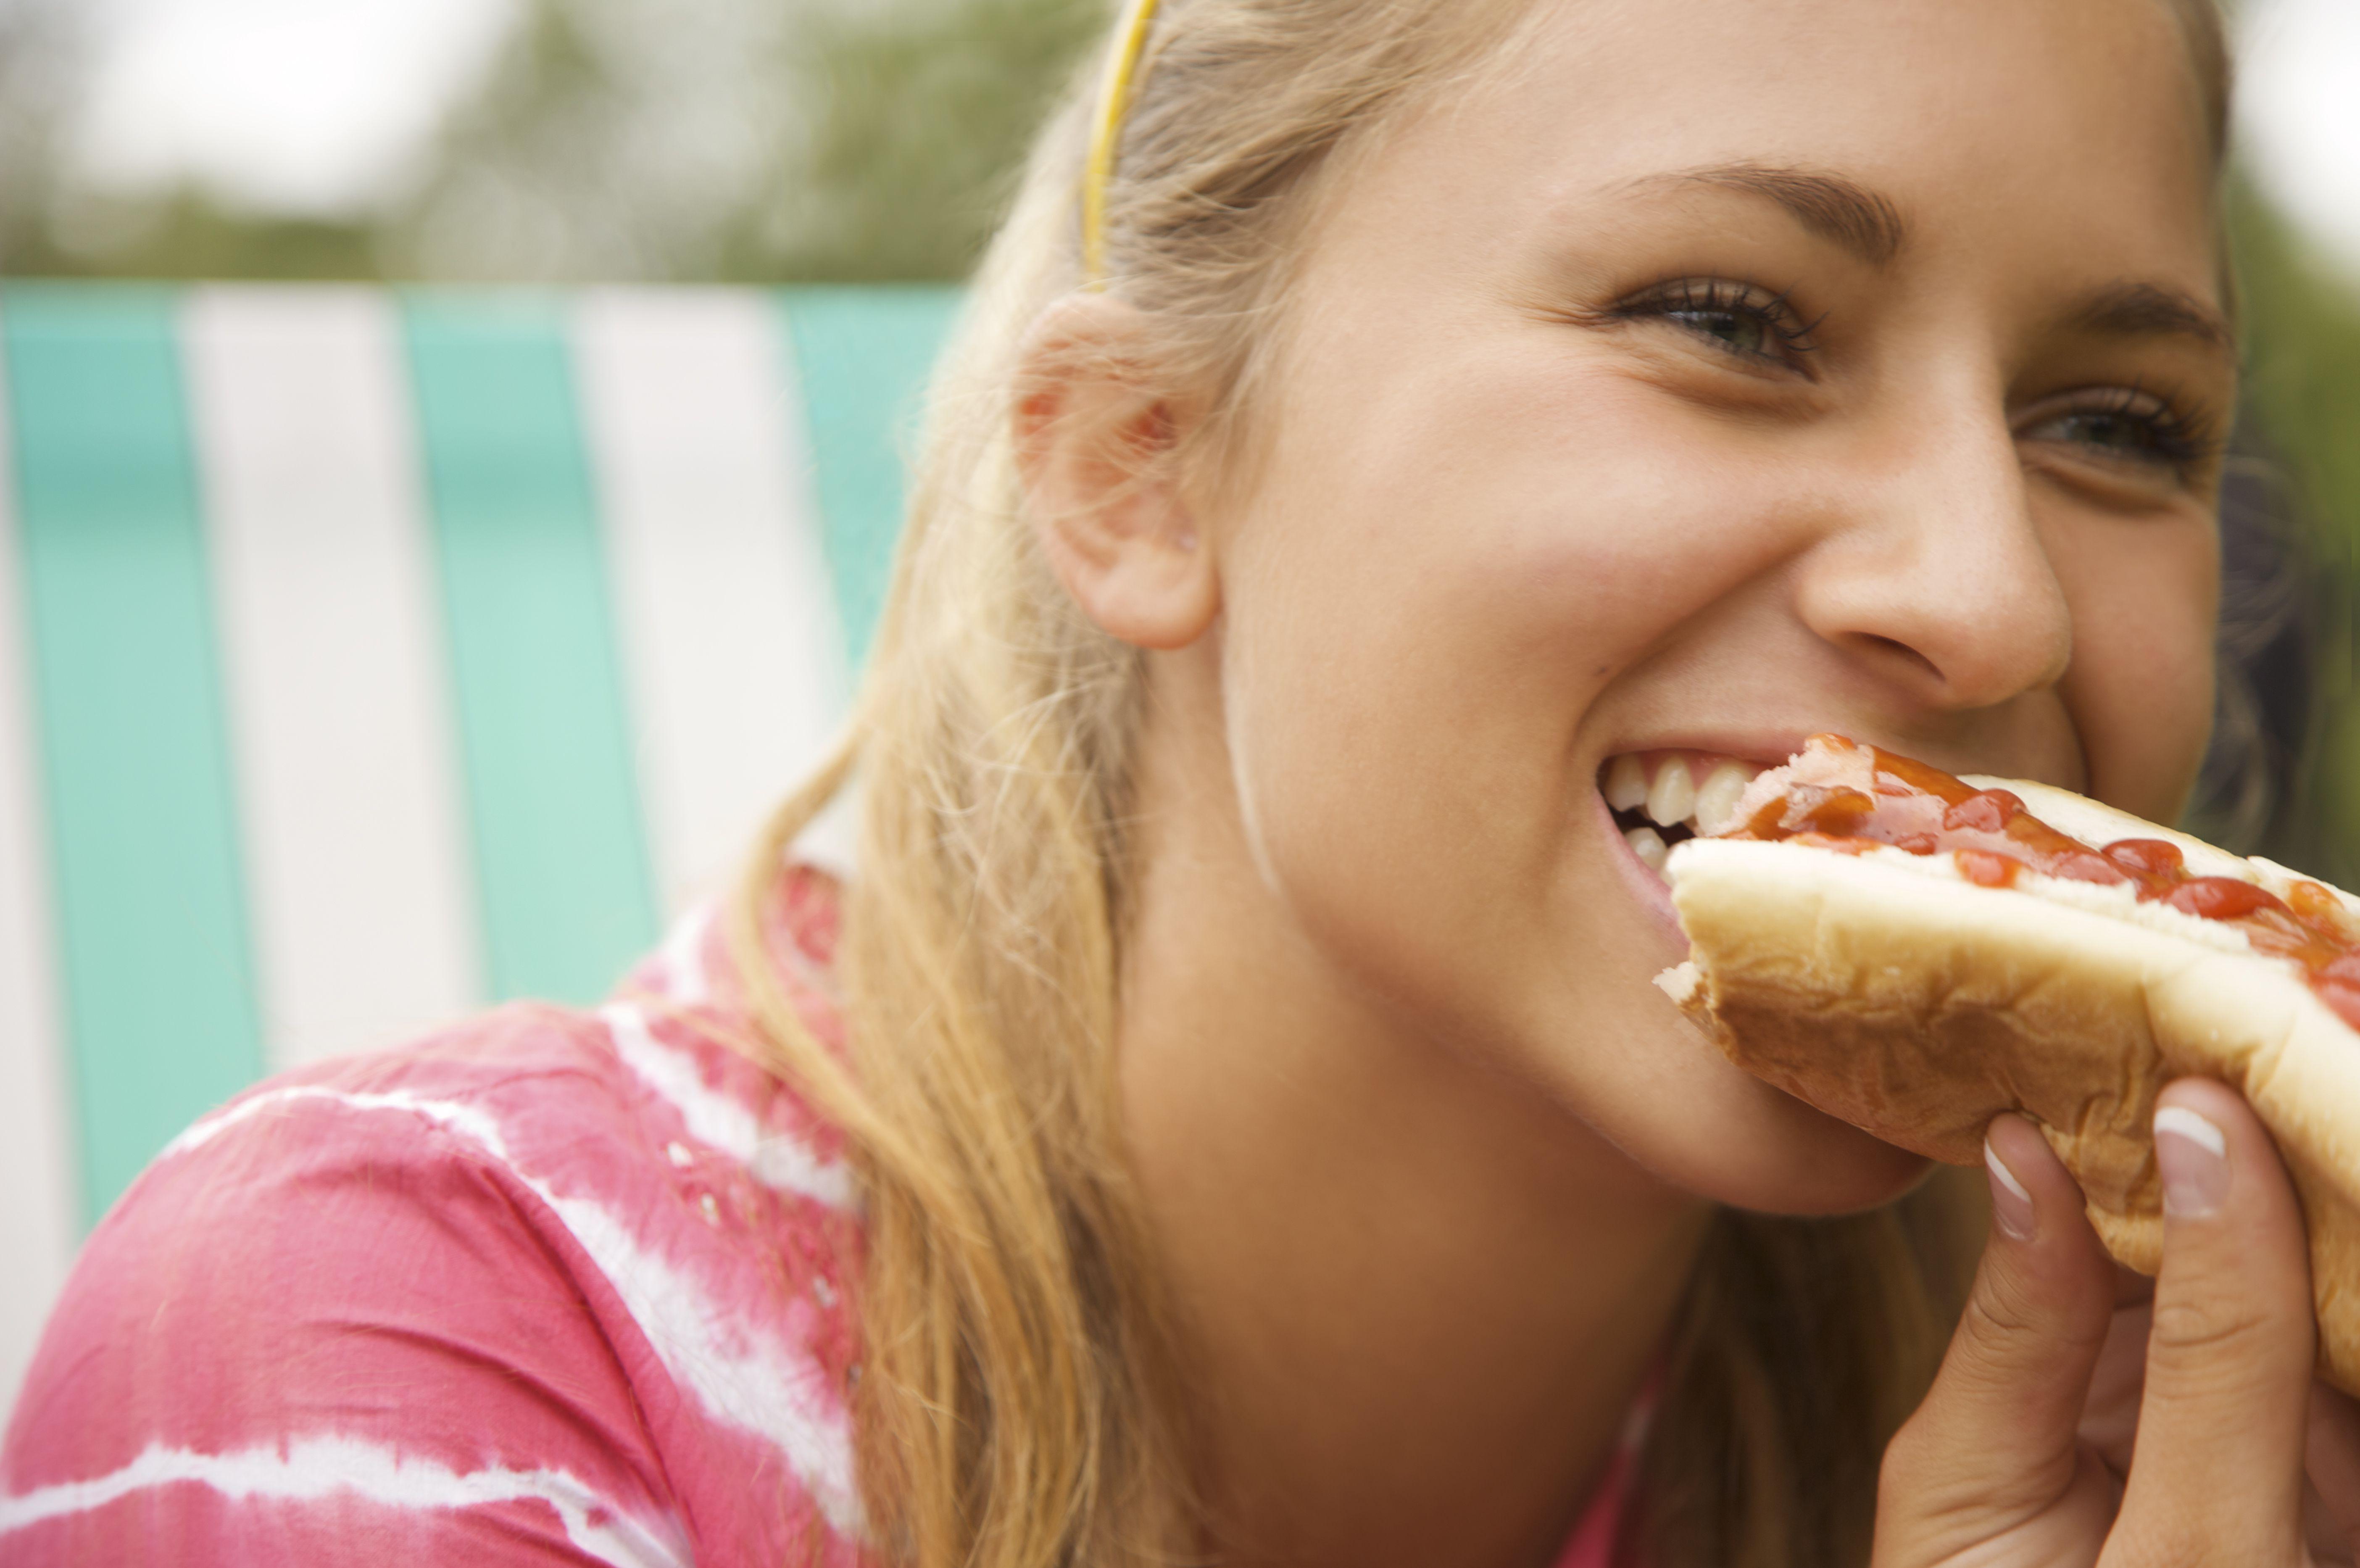 Close up of a teenaged girl eating a hot dog